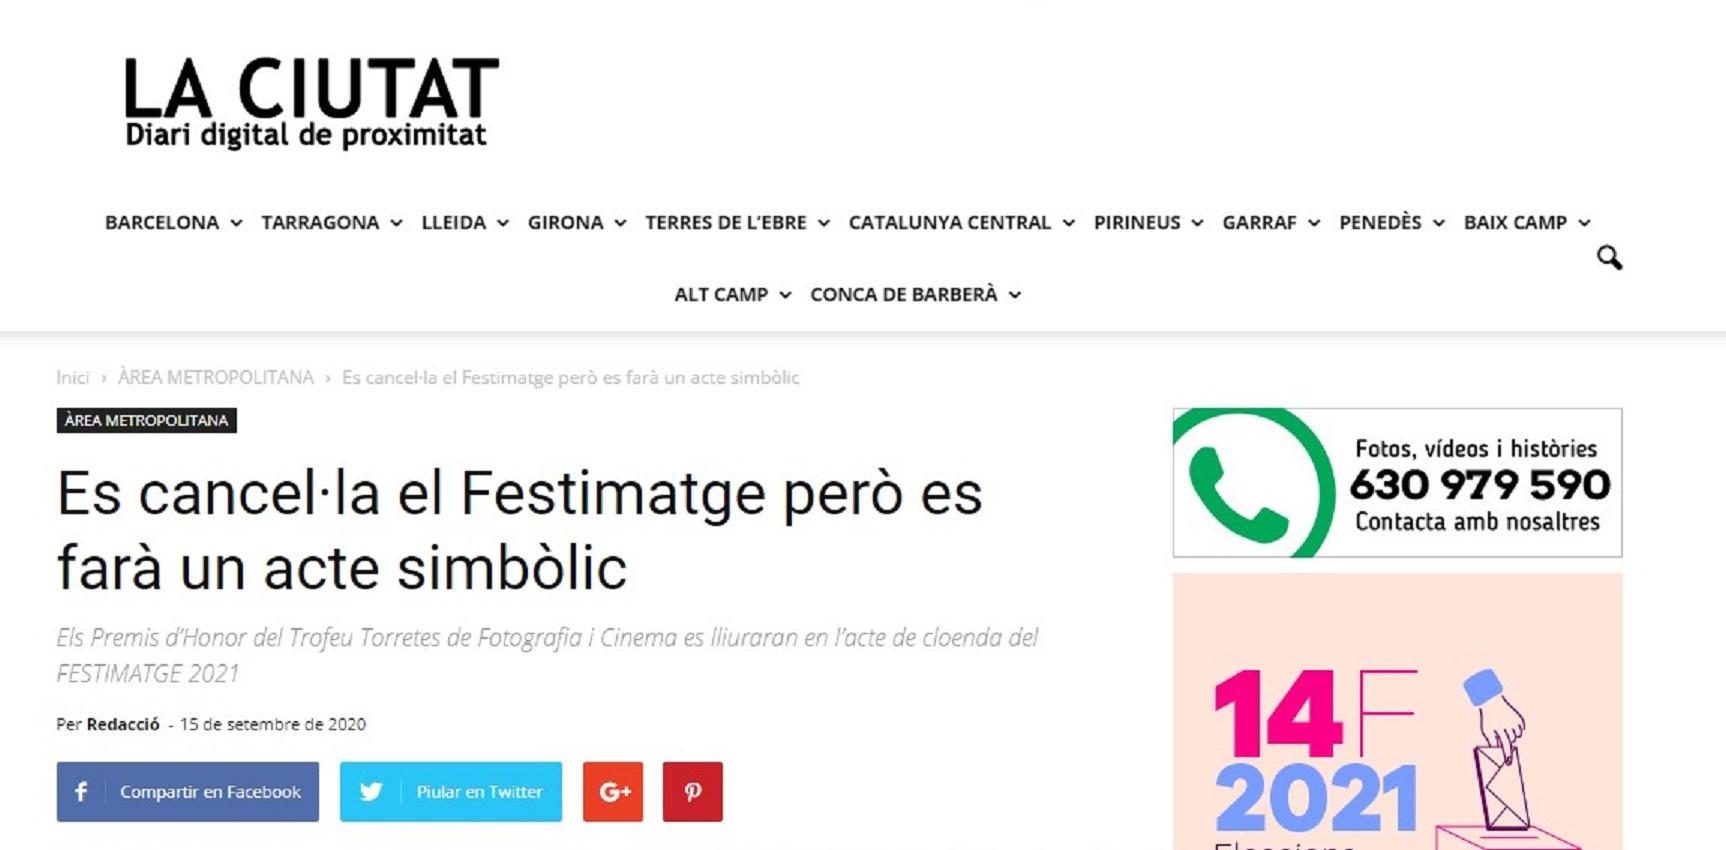 "Festimatge en ""La ciutat"" diario digital de proximidad - 15/09/2020 gabinete de prensa"